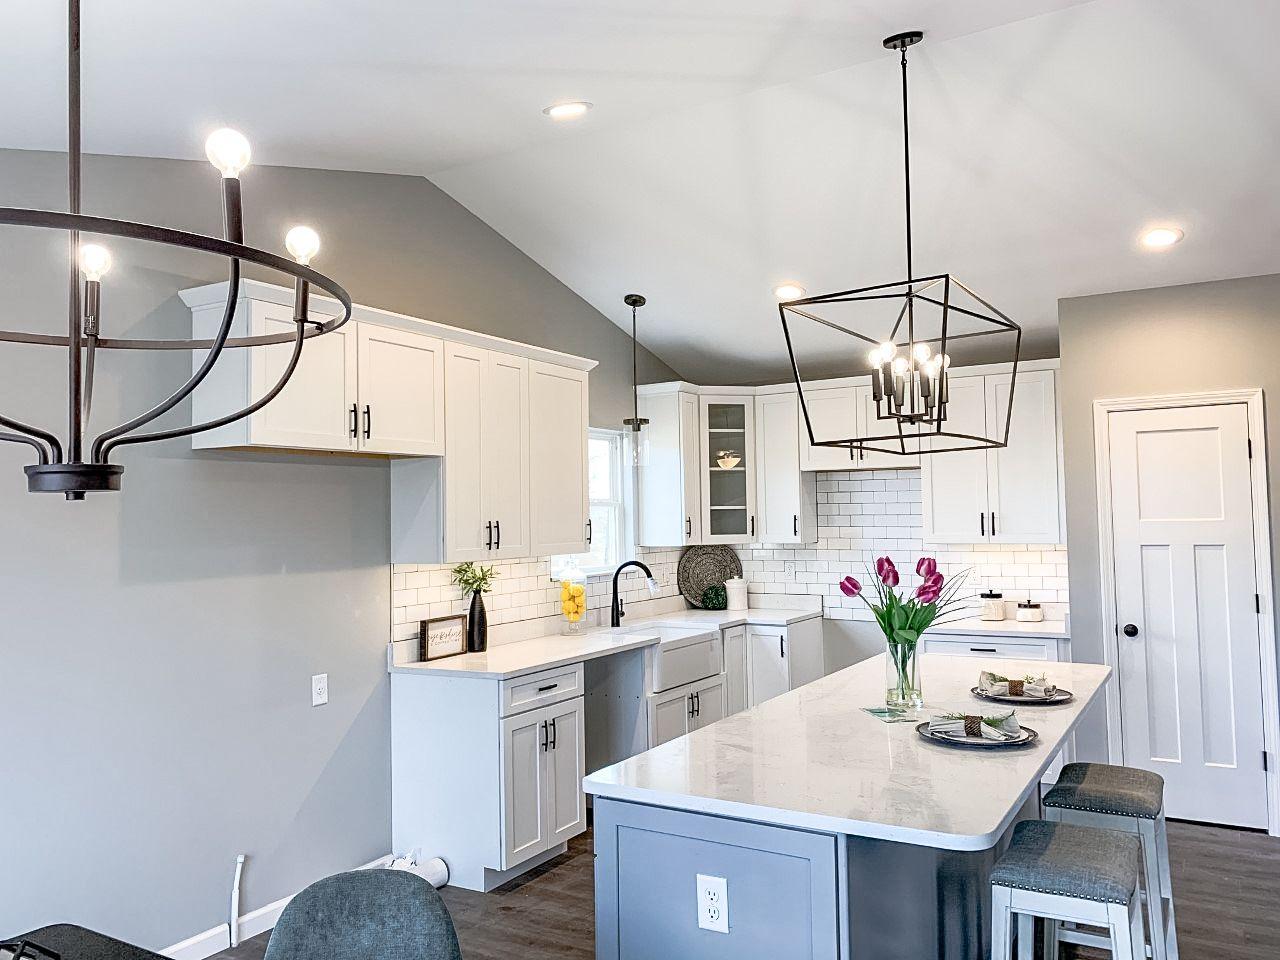 Kitchen featured in the Prescott B By C.A. Jones, Inc.  in St. Louis, IL